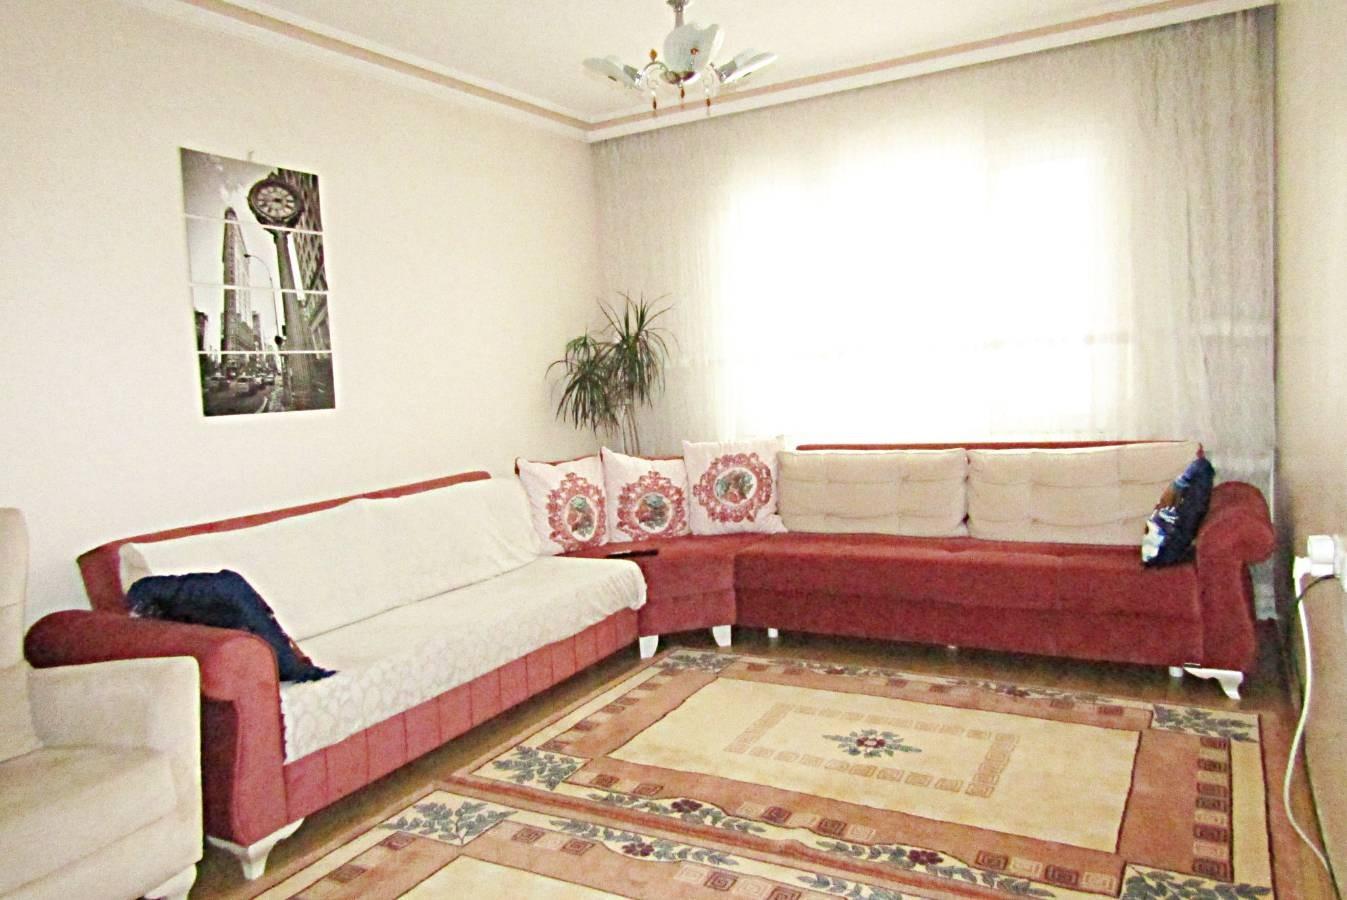 SR EMLAK'TAN SÜVARİ MAH'DE 3+1 120 m² TRENE YAKIN ARA KATTA  YAPILI DAİRE